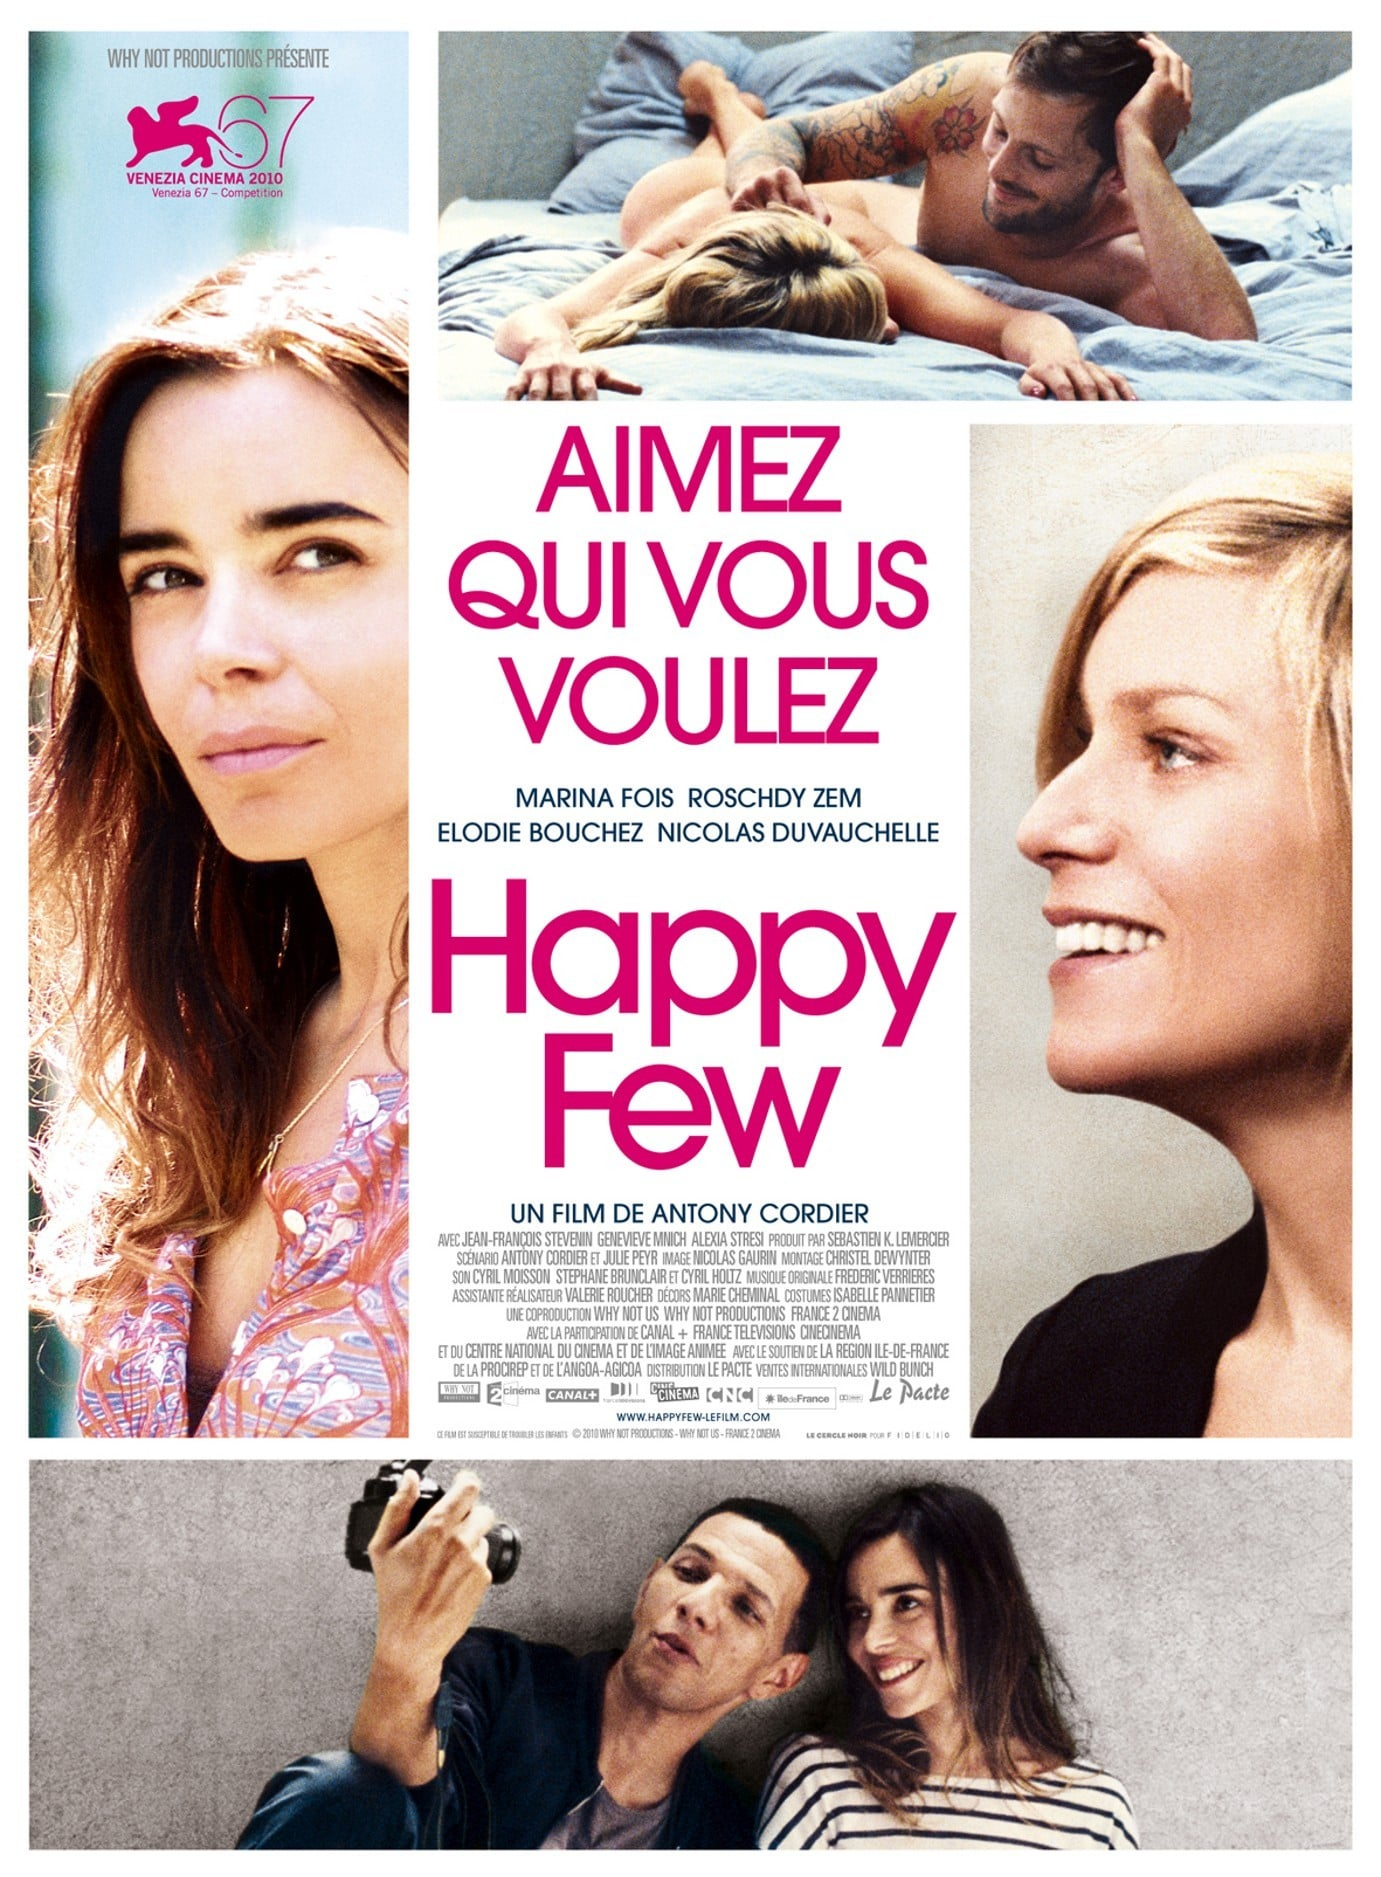 affiche du film Happy Few